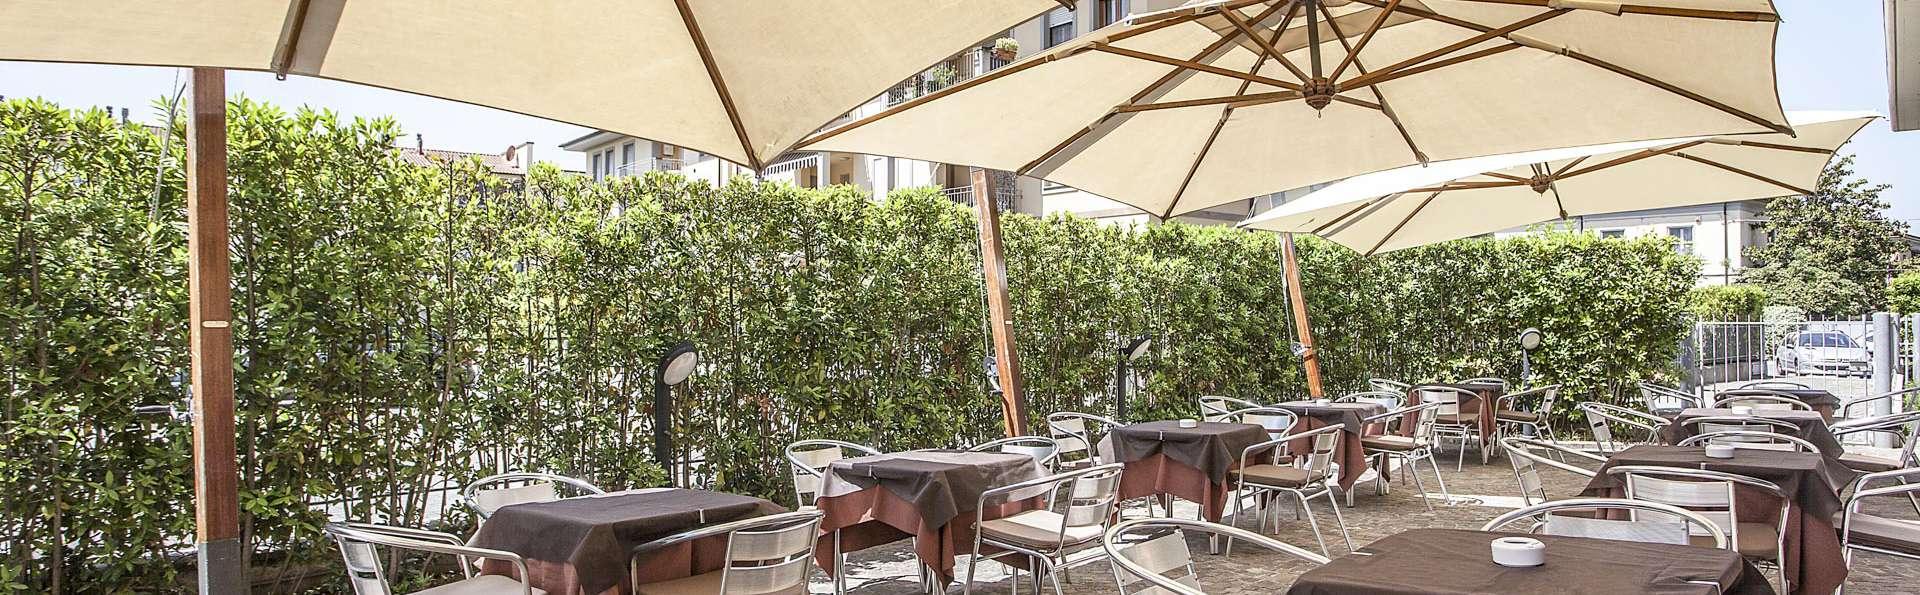 Grand Hotel Bonanno - EDIT_TERRACE_02.jpg